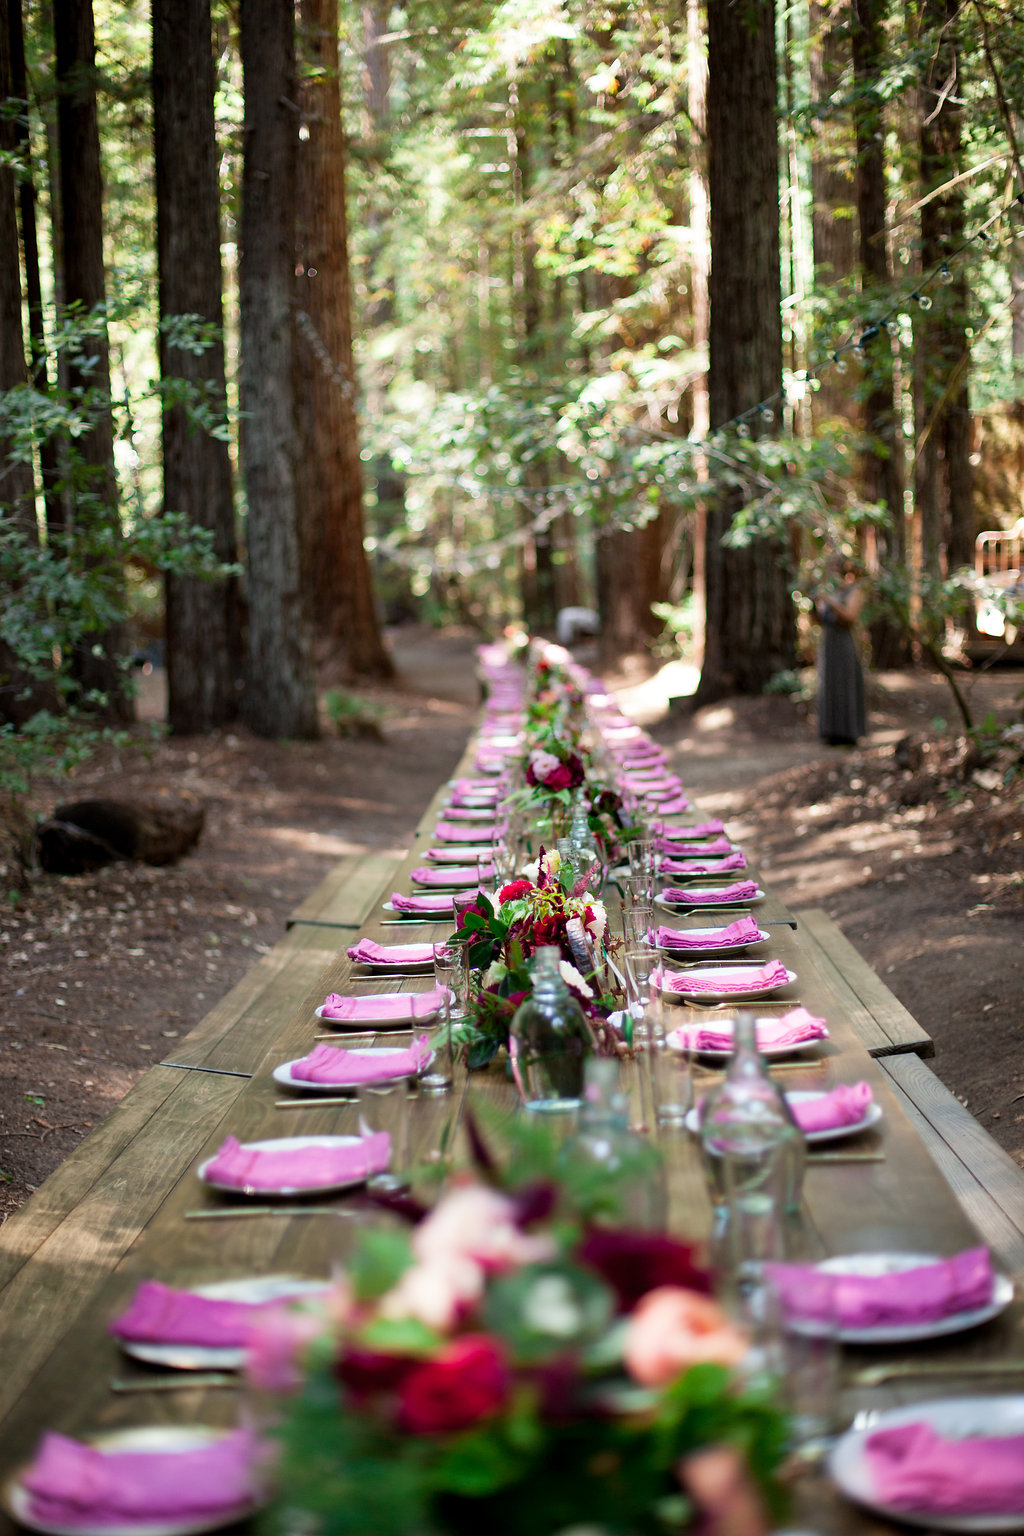 lillich-manogue-wedding-1129.jpg